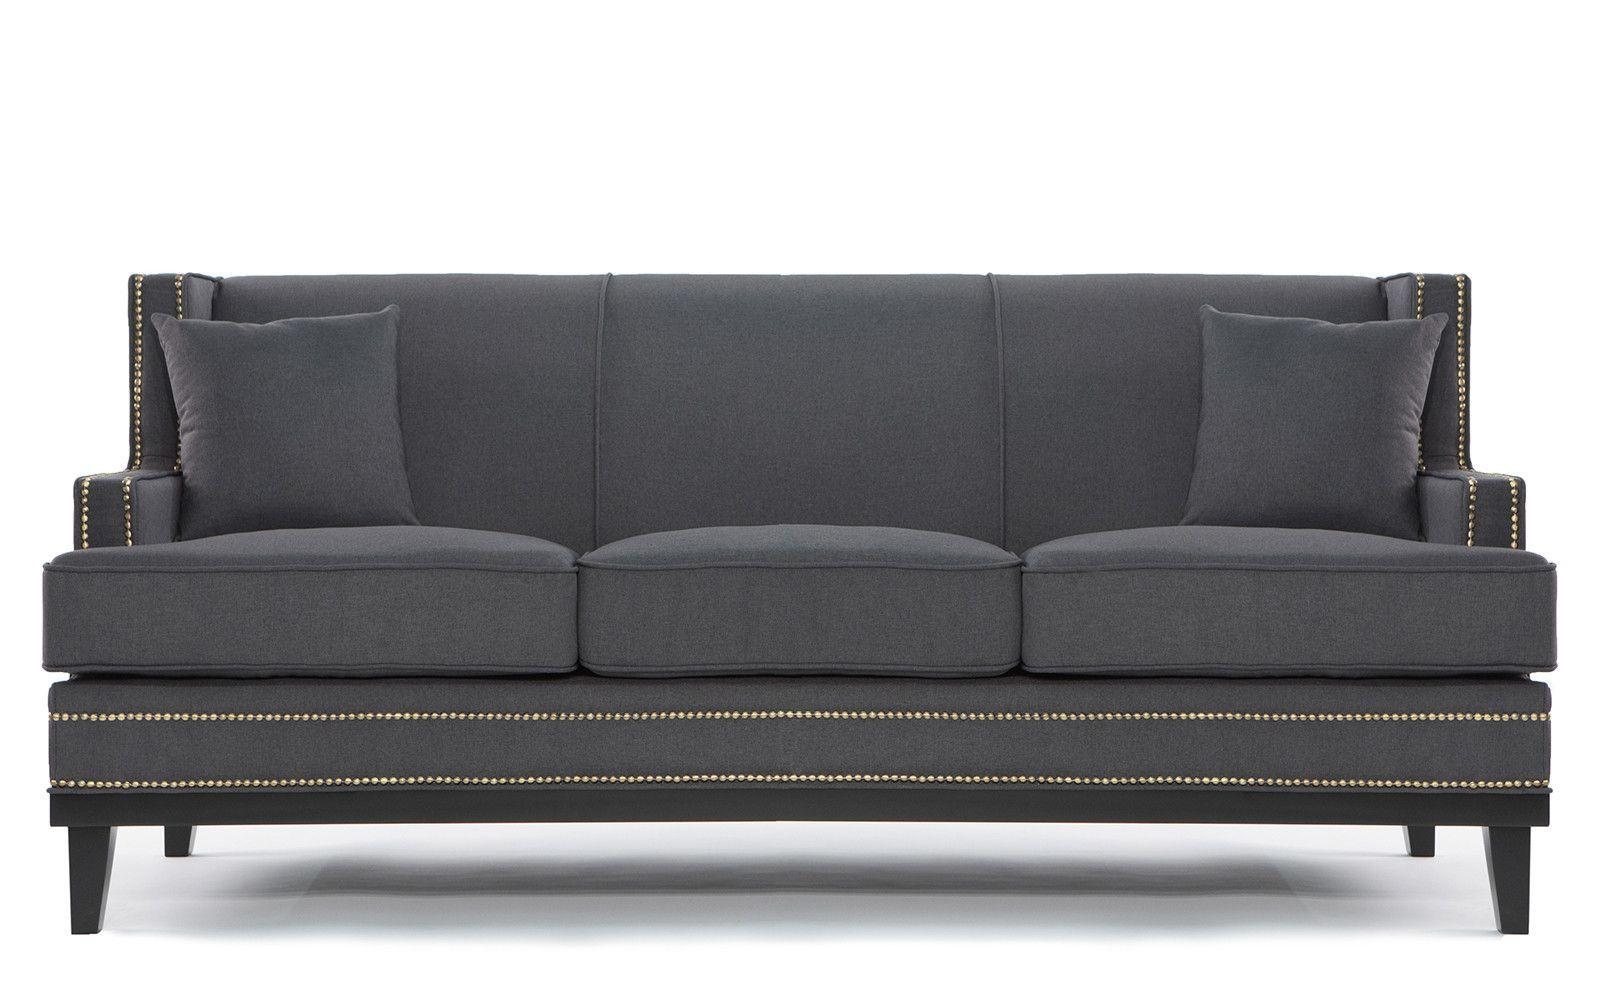 Abe Modern Nailhead Trim Linen Sofa   Linen Sofa, Sofa Inside Radcliff Nailhead Trim Sectional Sofas Gray (View 7 of 15)